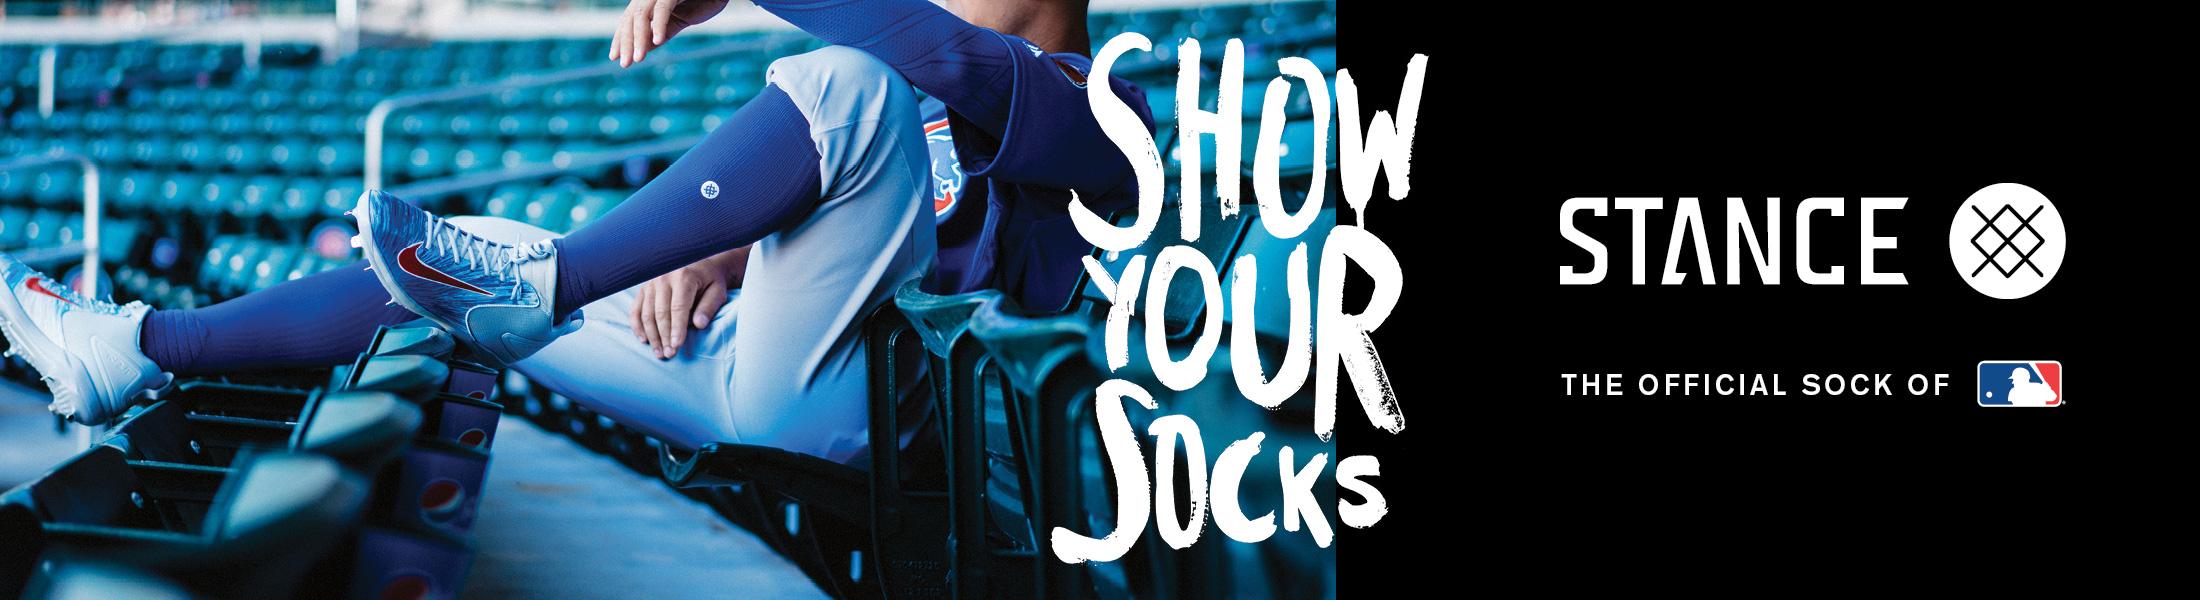 Chicago Cubs Socks at Stance at SportsWorldChicago.com